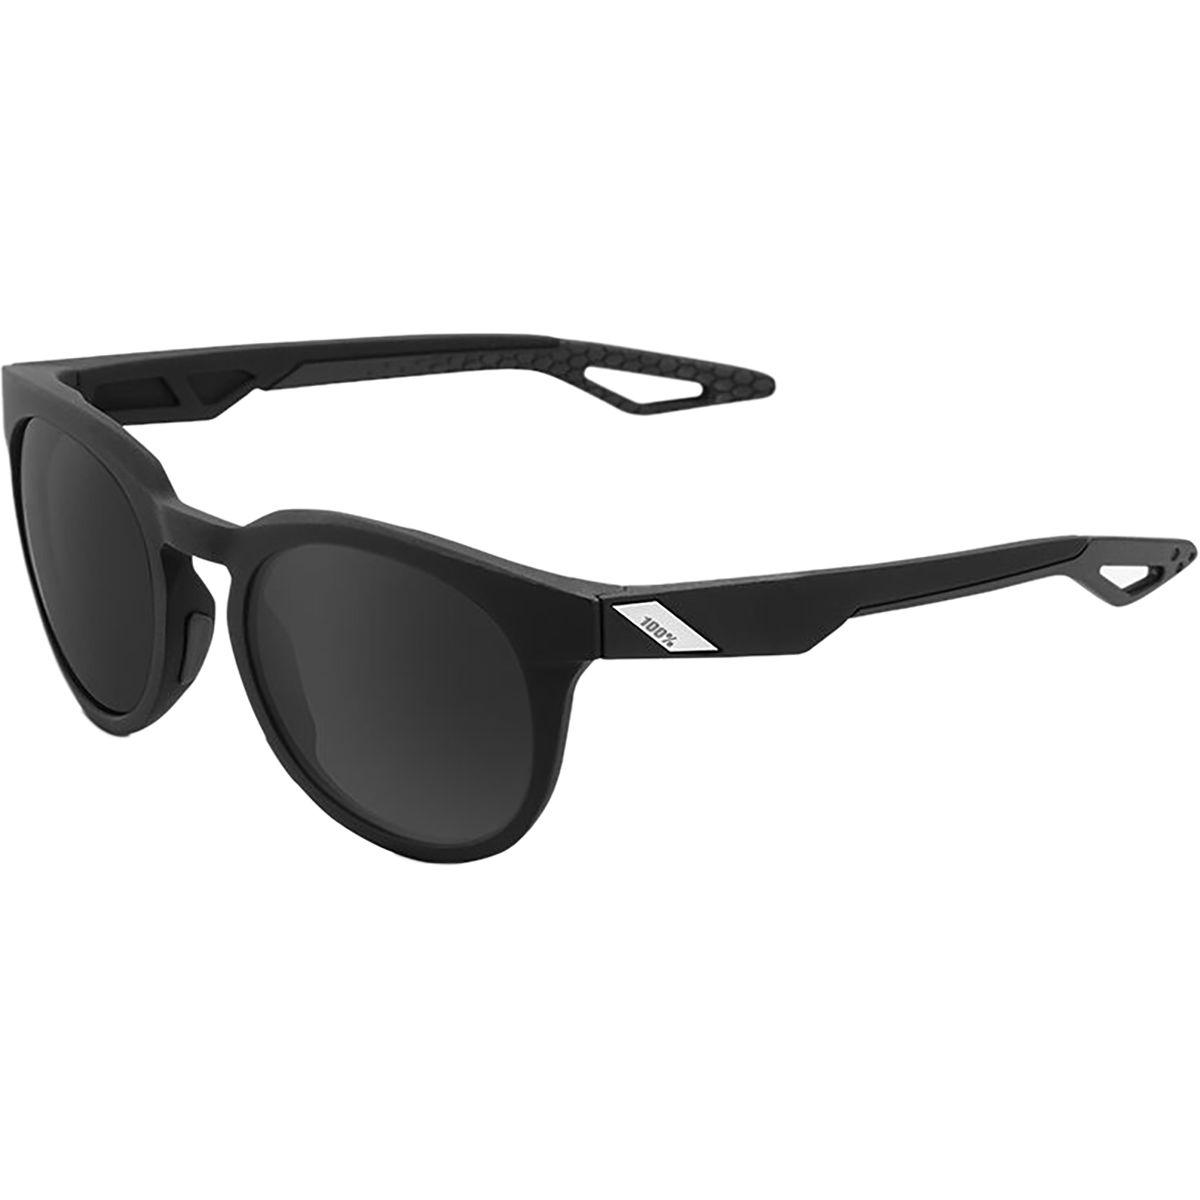 100 Campo Sunglasses Matte Black Smoke Lens One Size